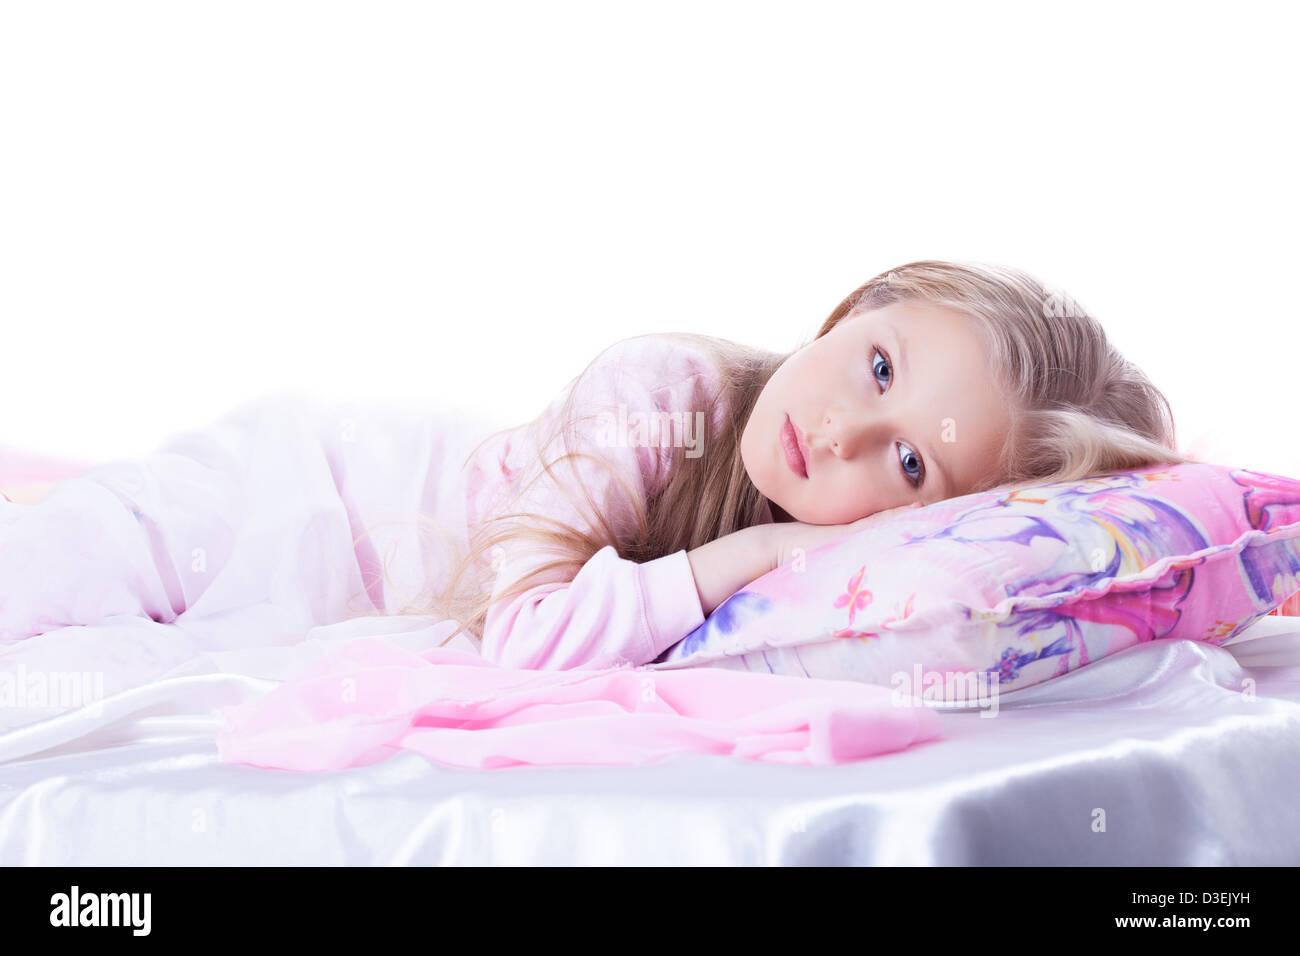 Little girl lying on bed - Stock Image